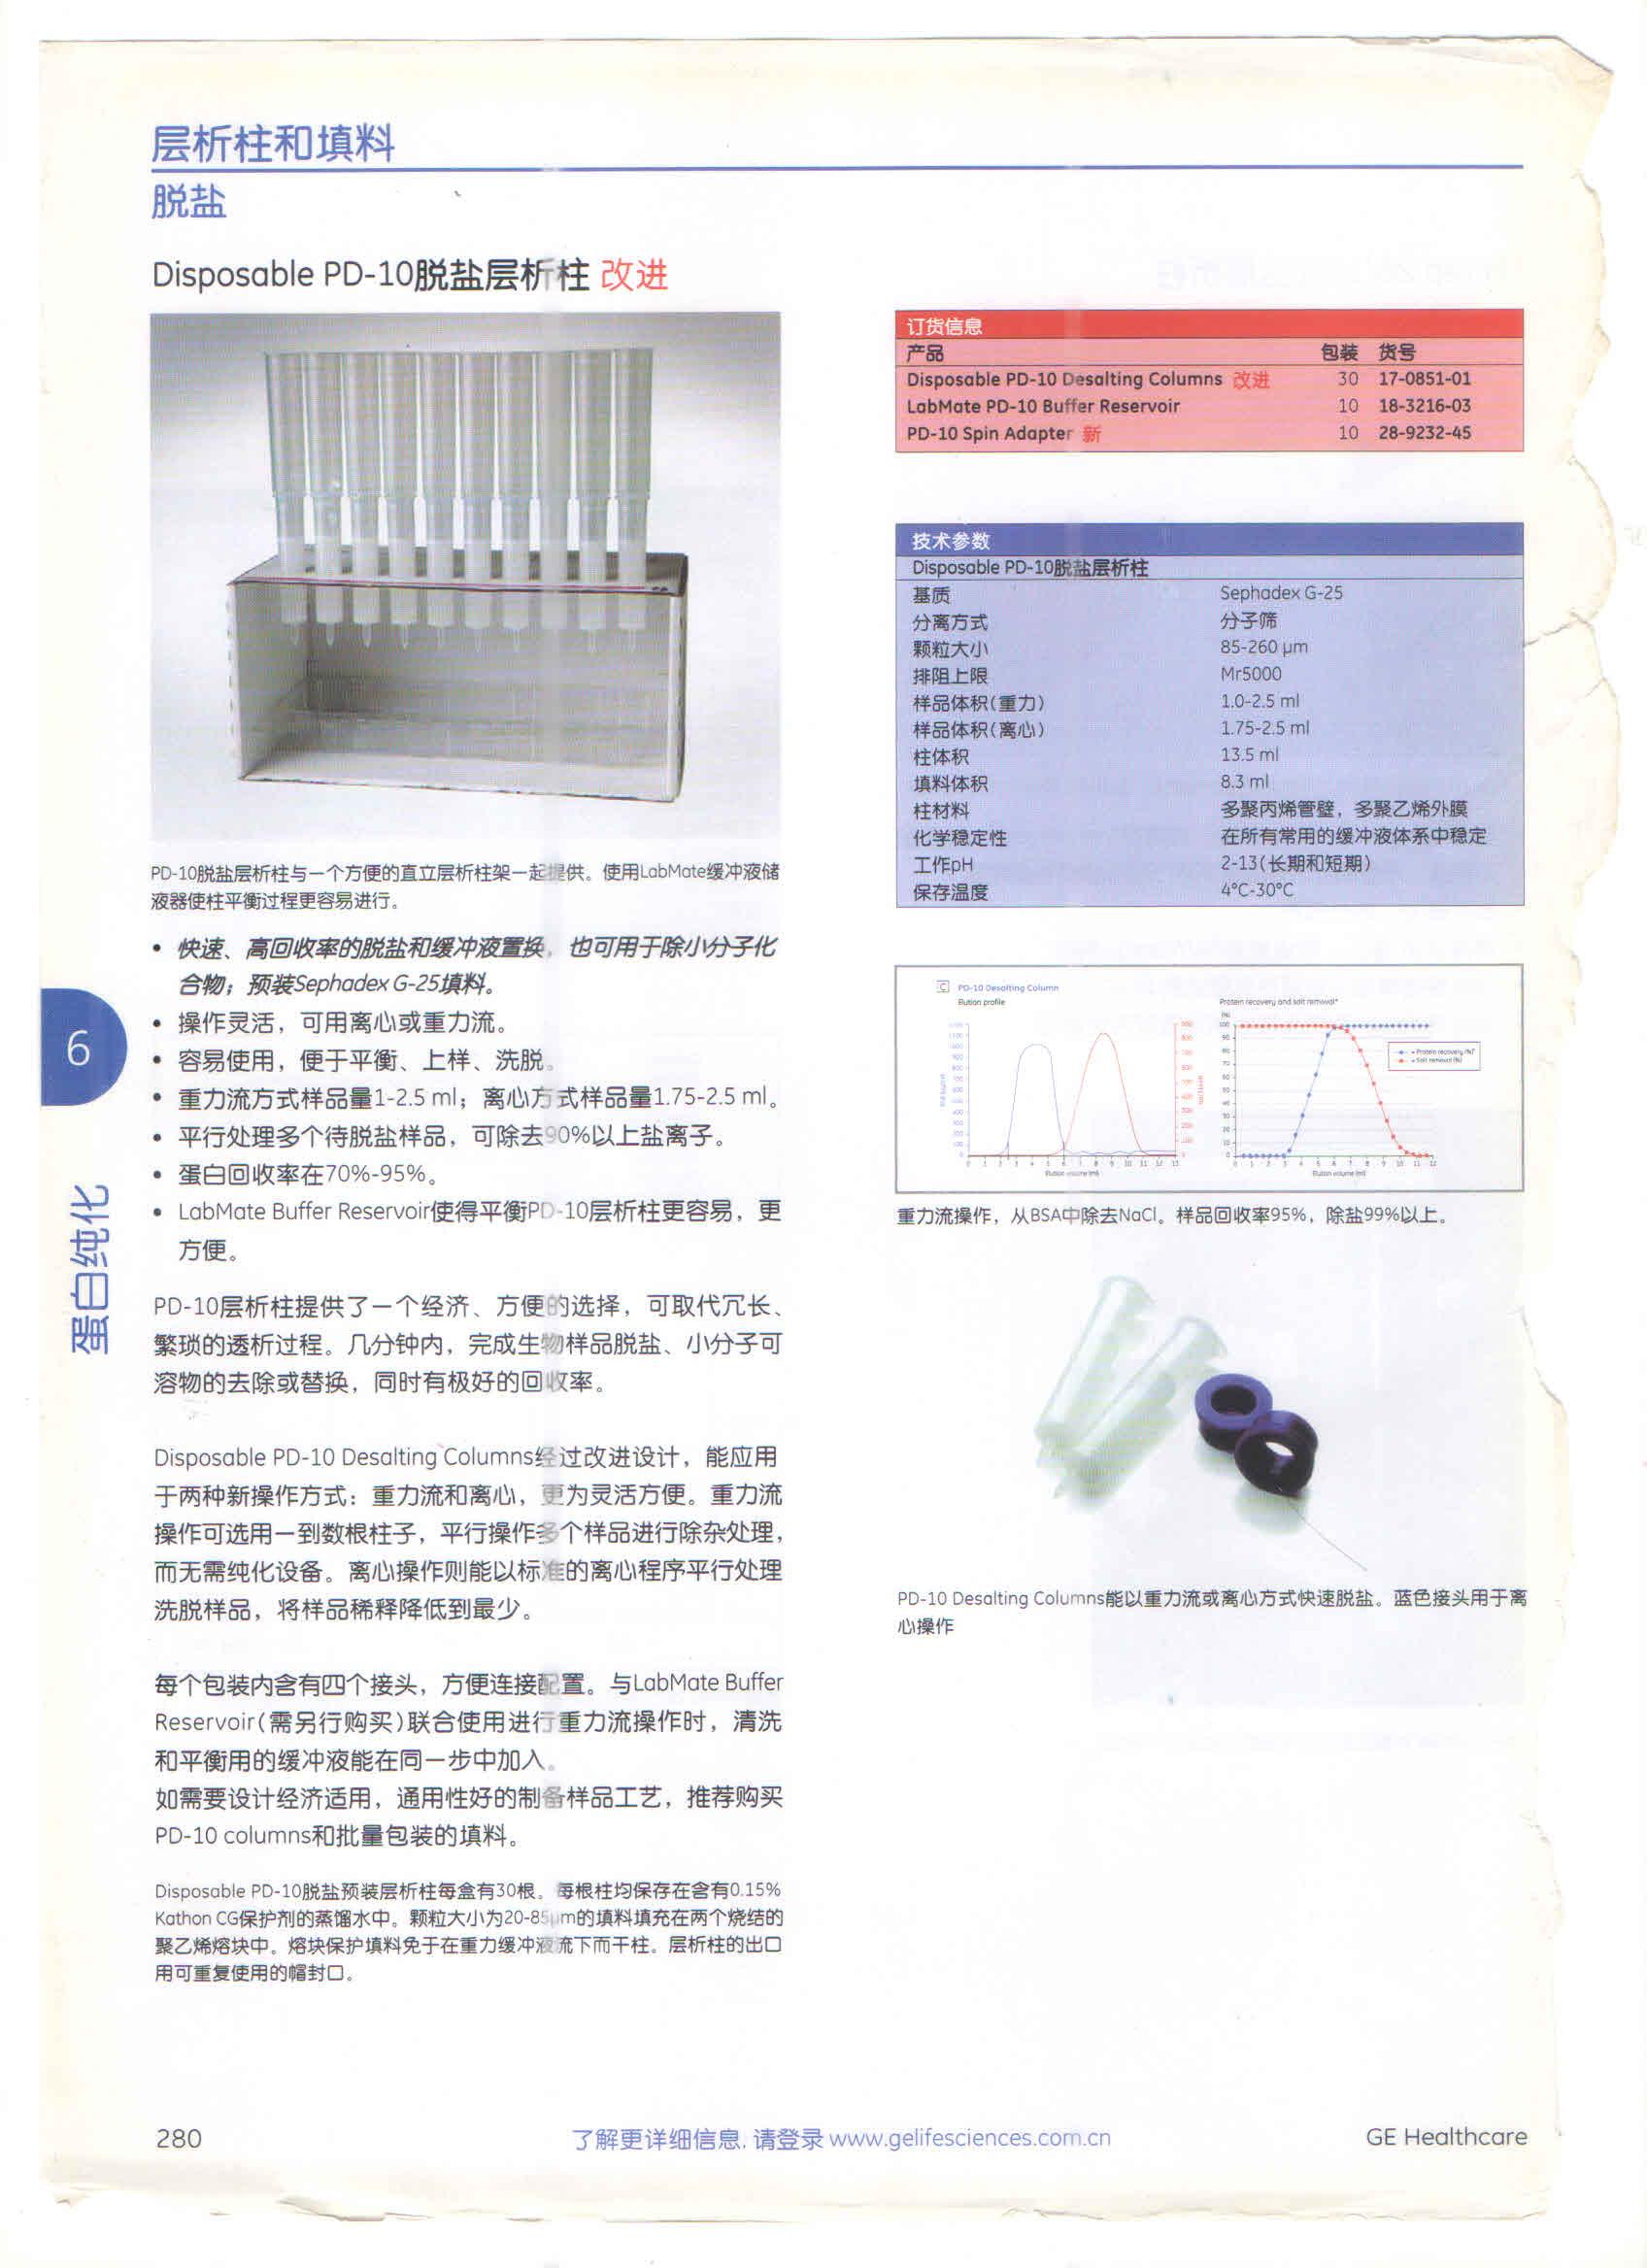 GE Disposable PD-10脱盐层析柱17085101